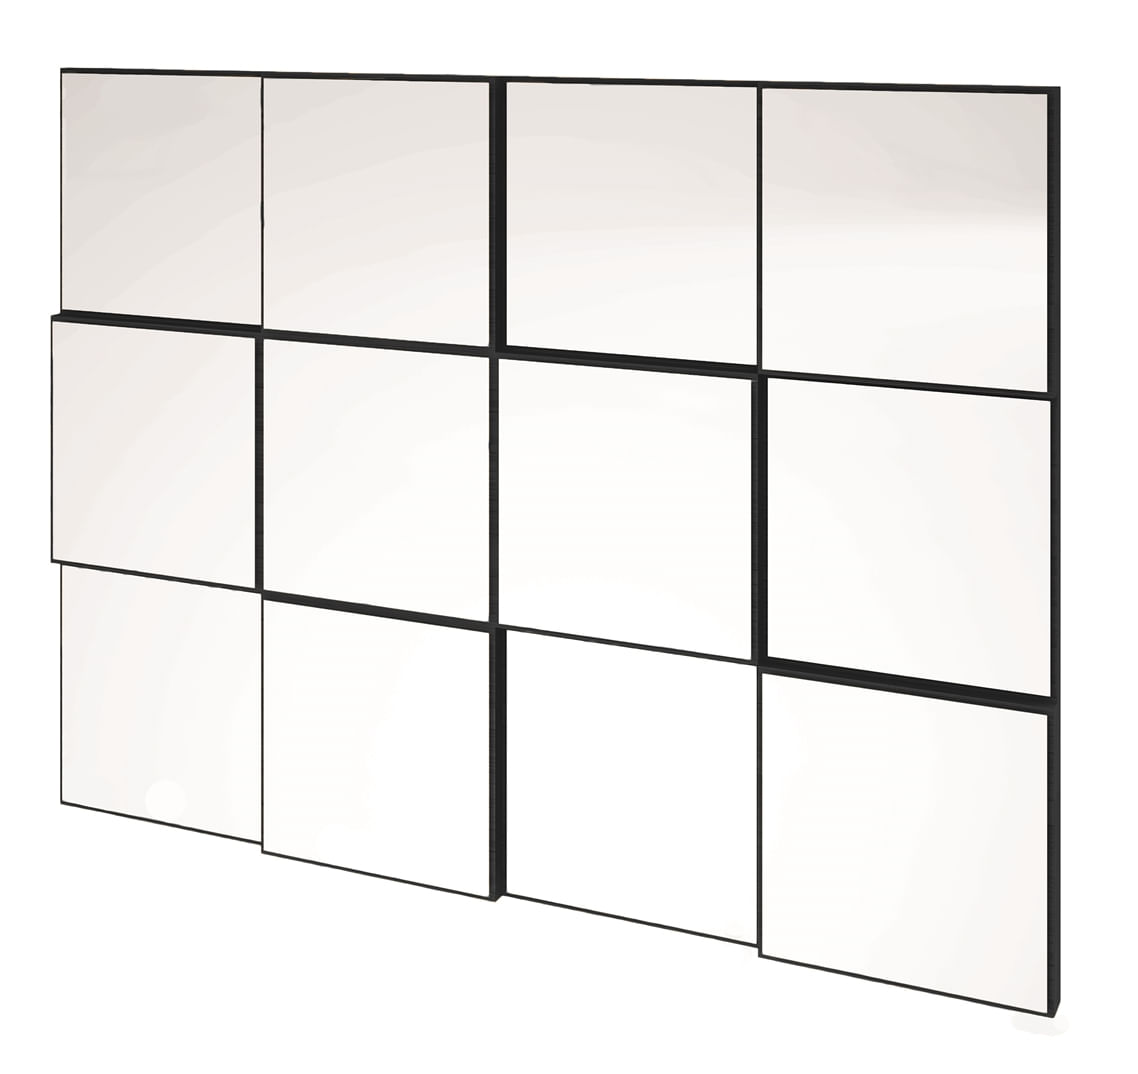 Quadro Espelho Block Medio 1,00 MT (LARG) cor Preto Brilho - 45043